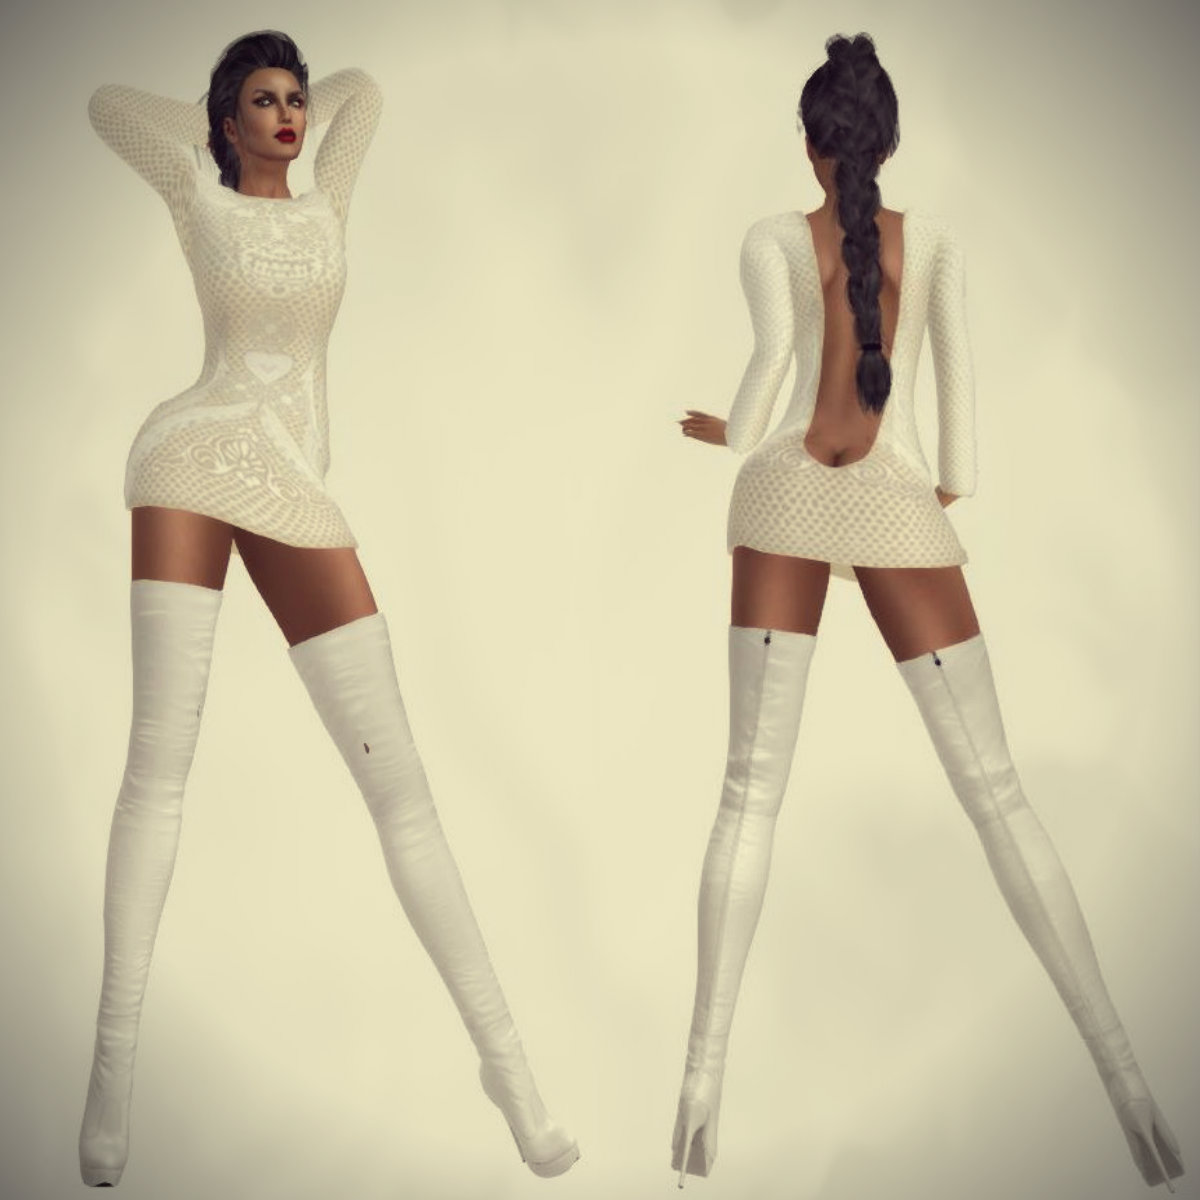 only for sexy but classy girls delourdes mimis choice best rh mimischoice blogspot com